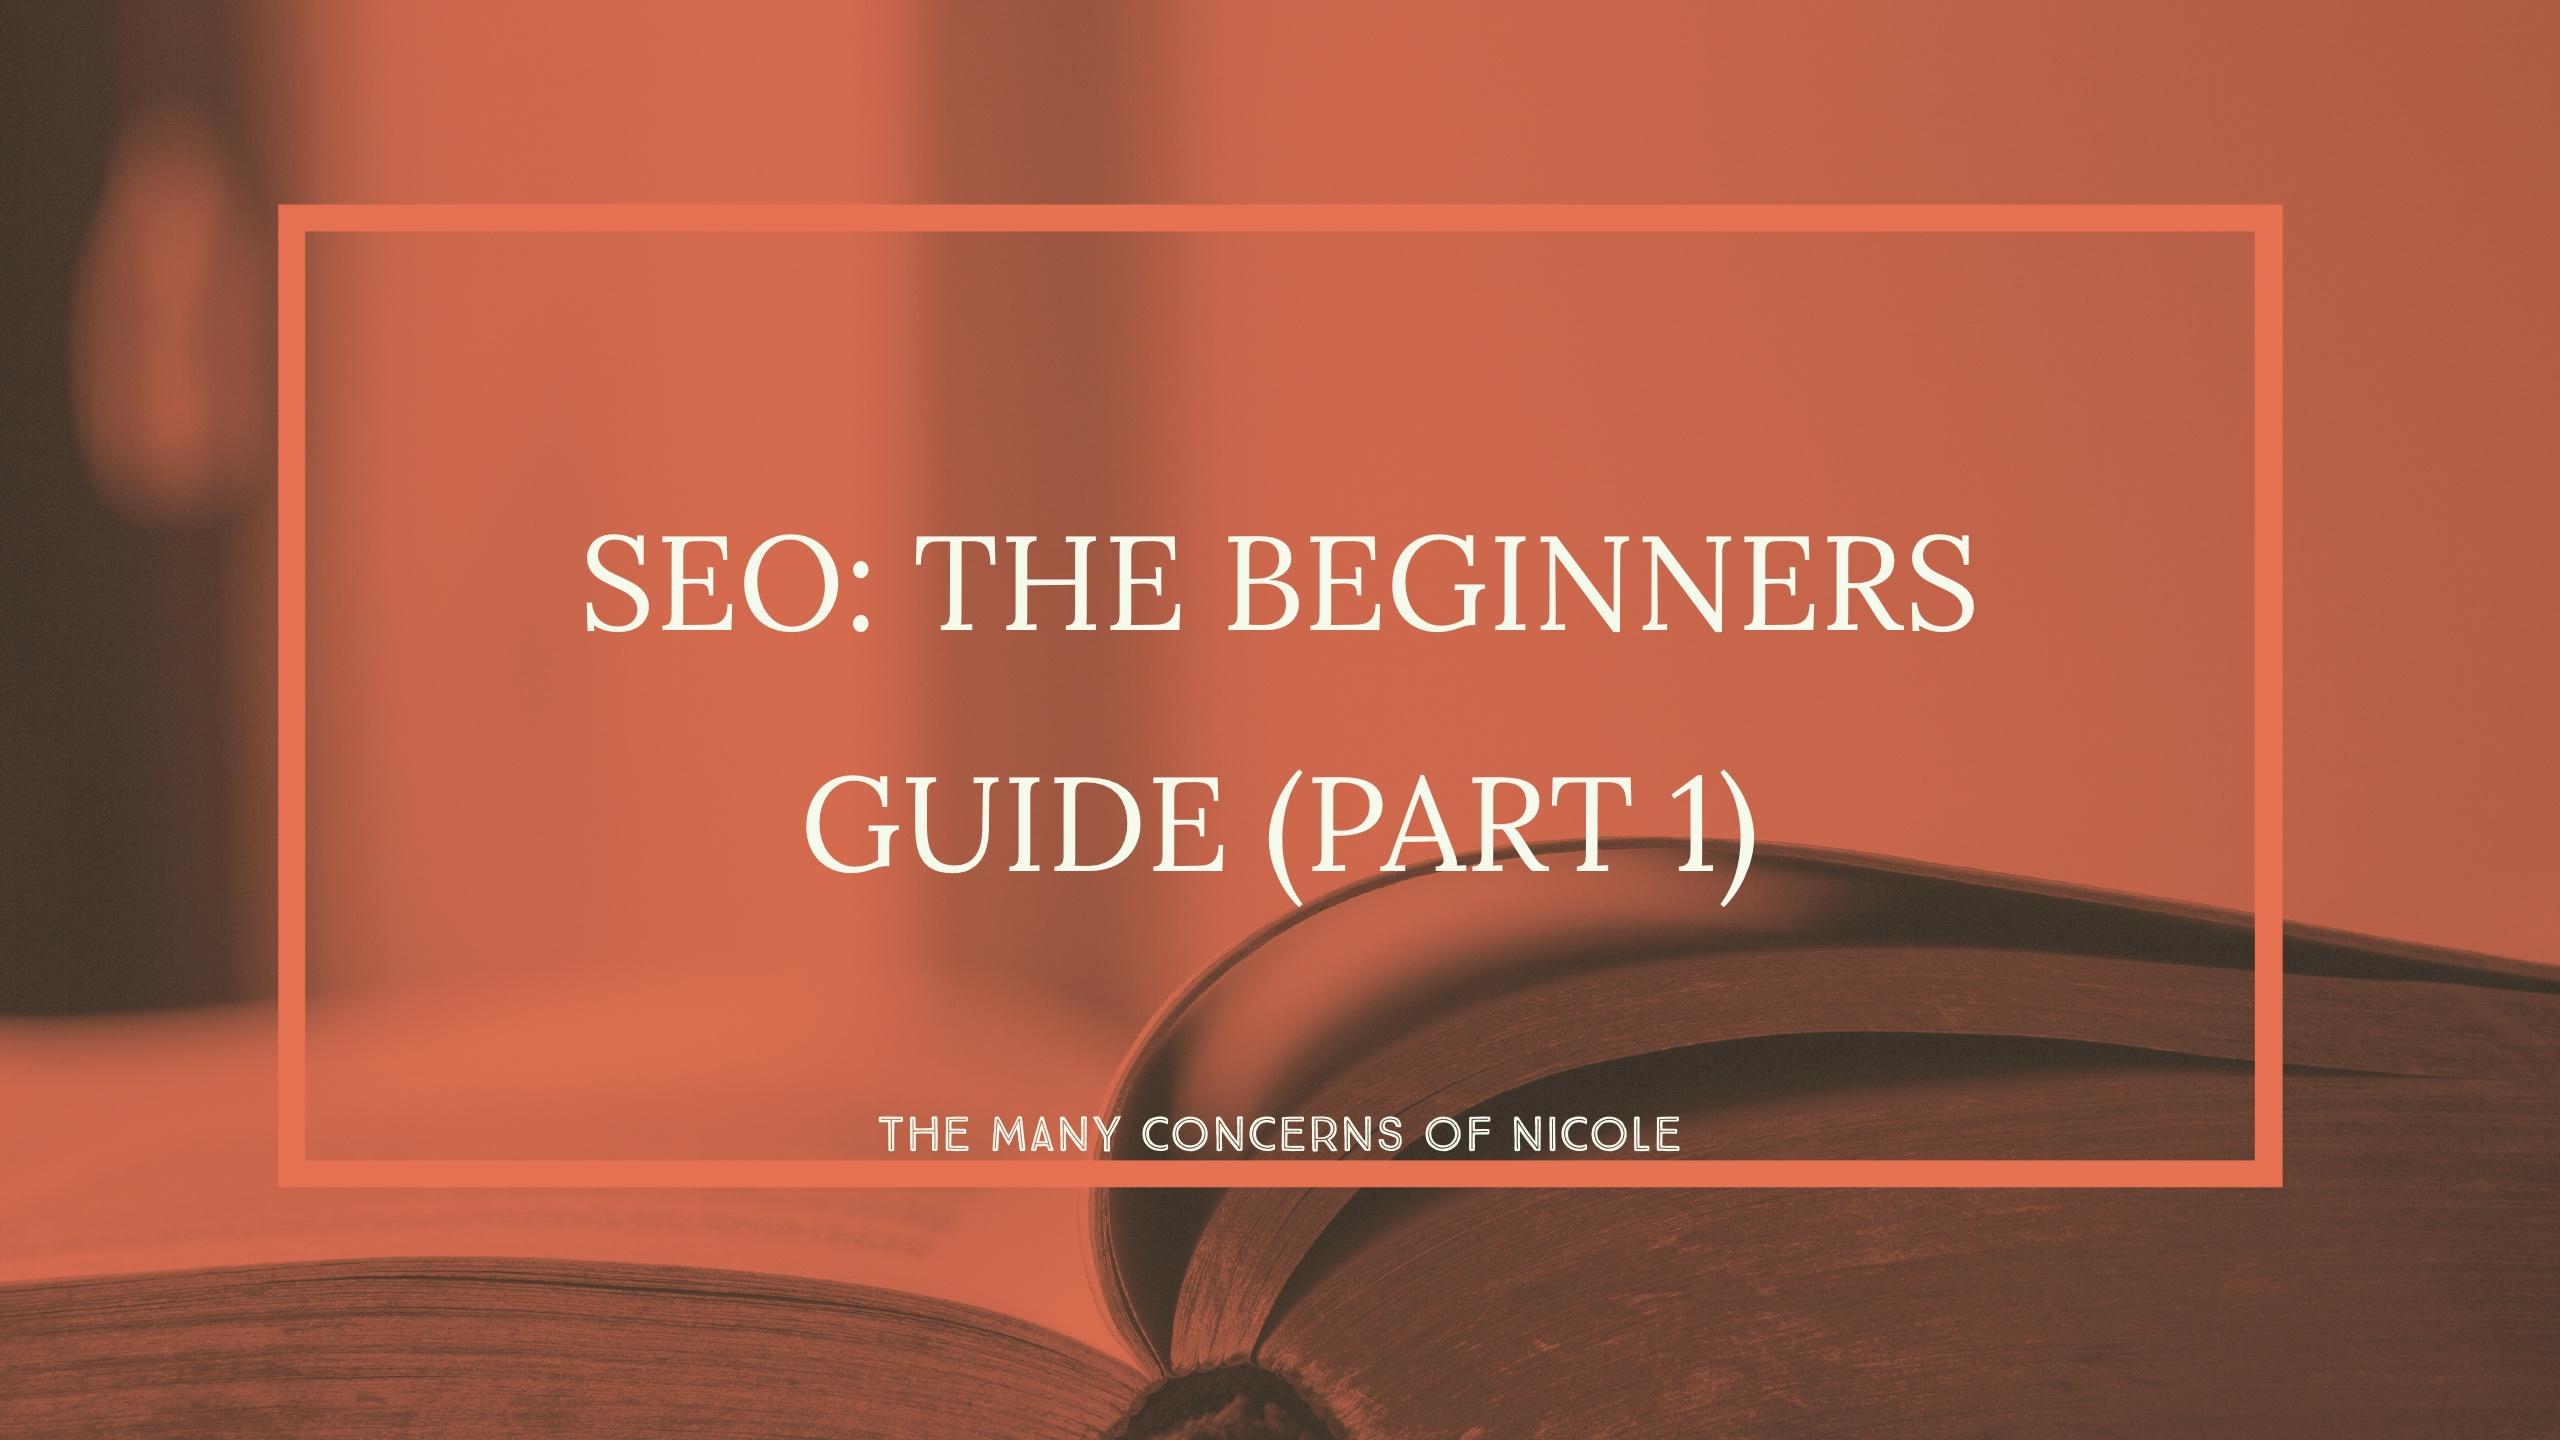 SEO beginners guide